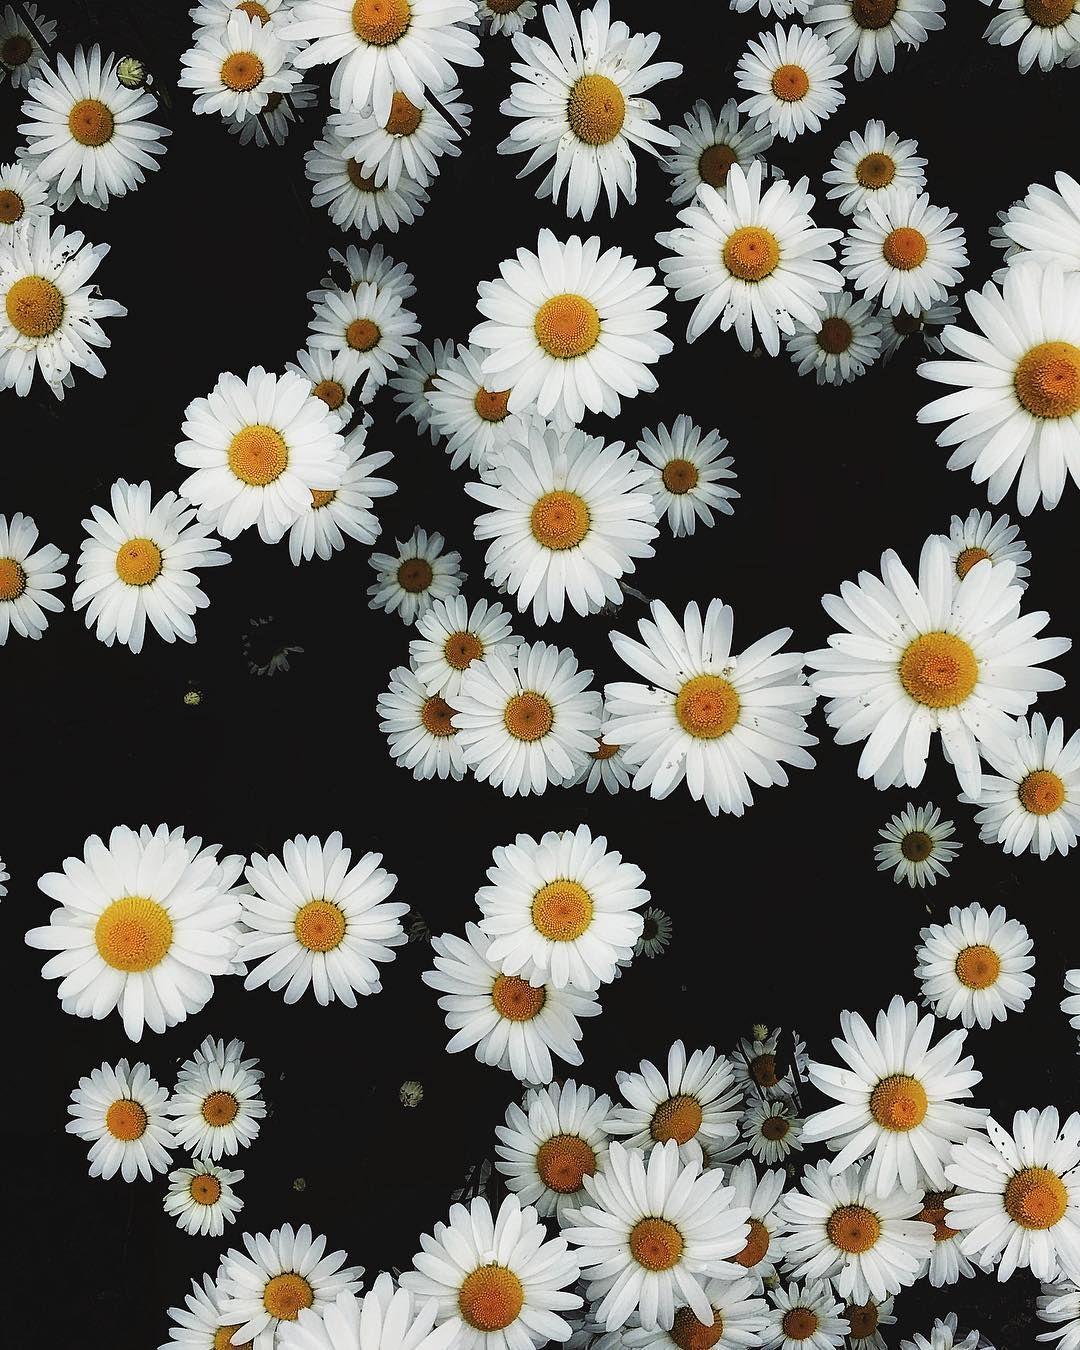 Pin By Georgina Leon On Flowers